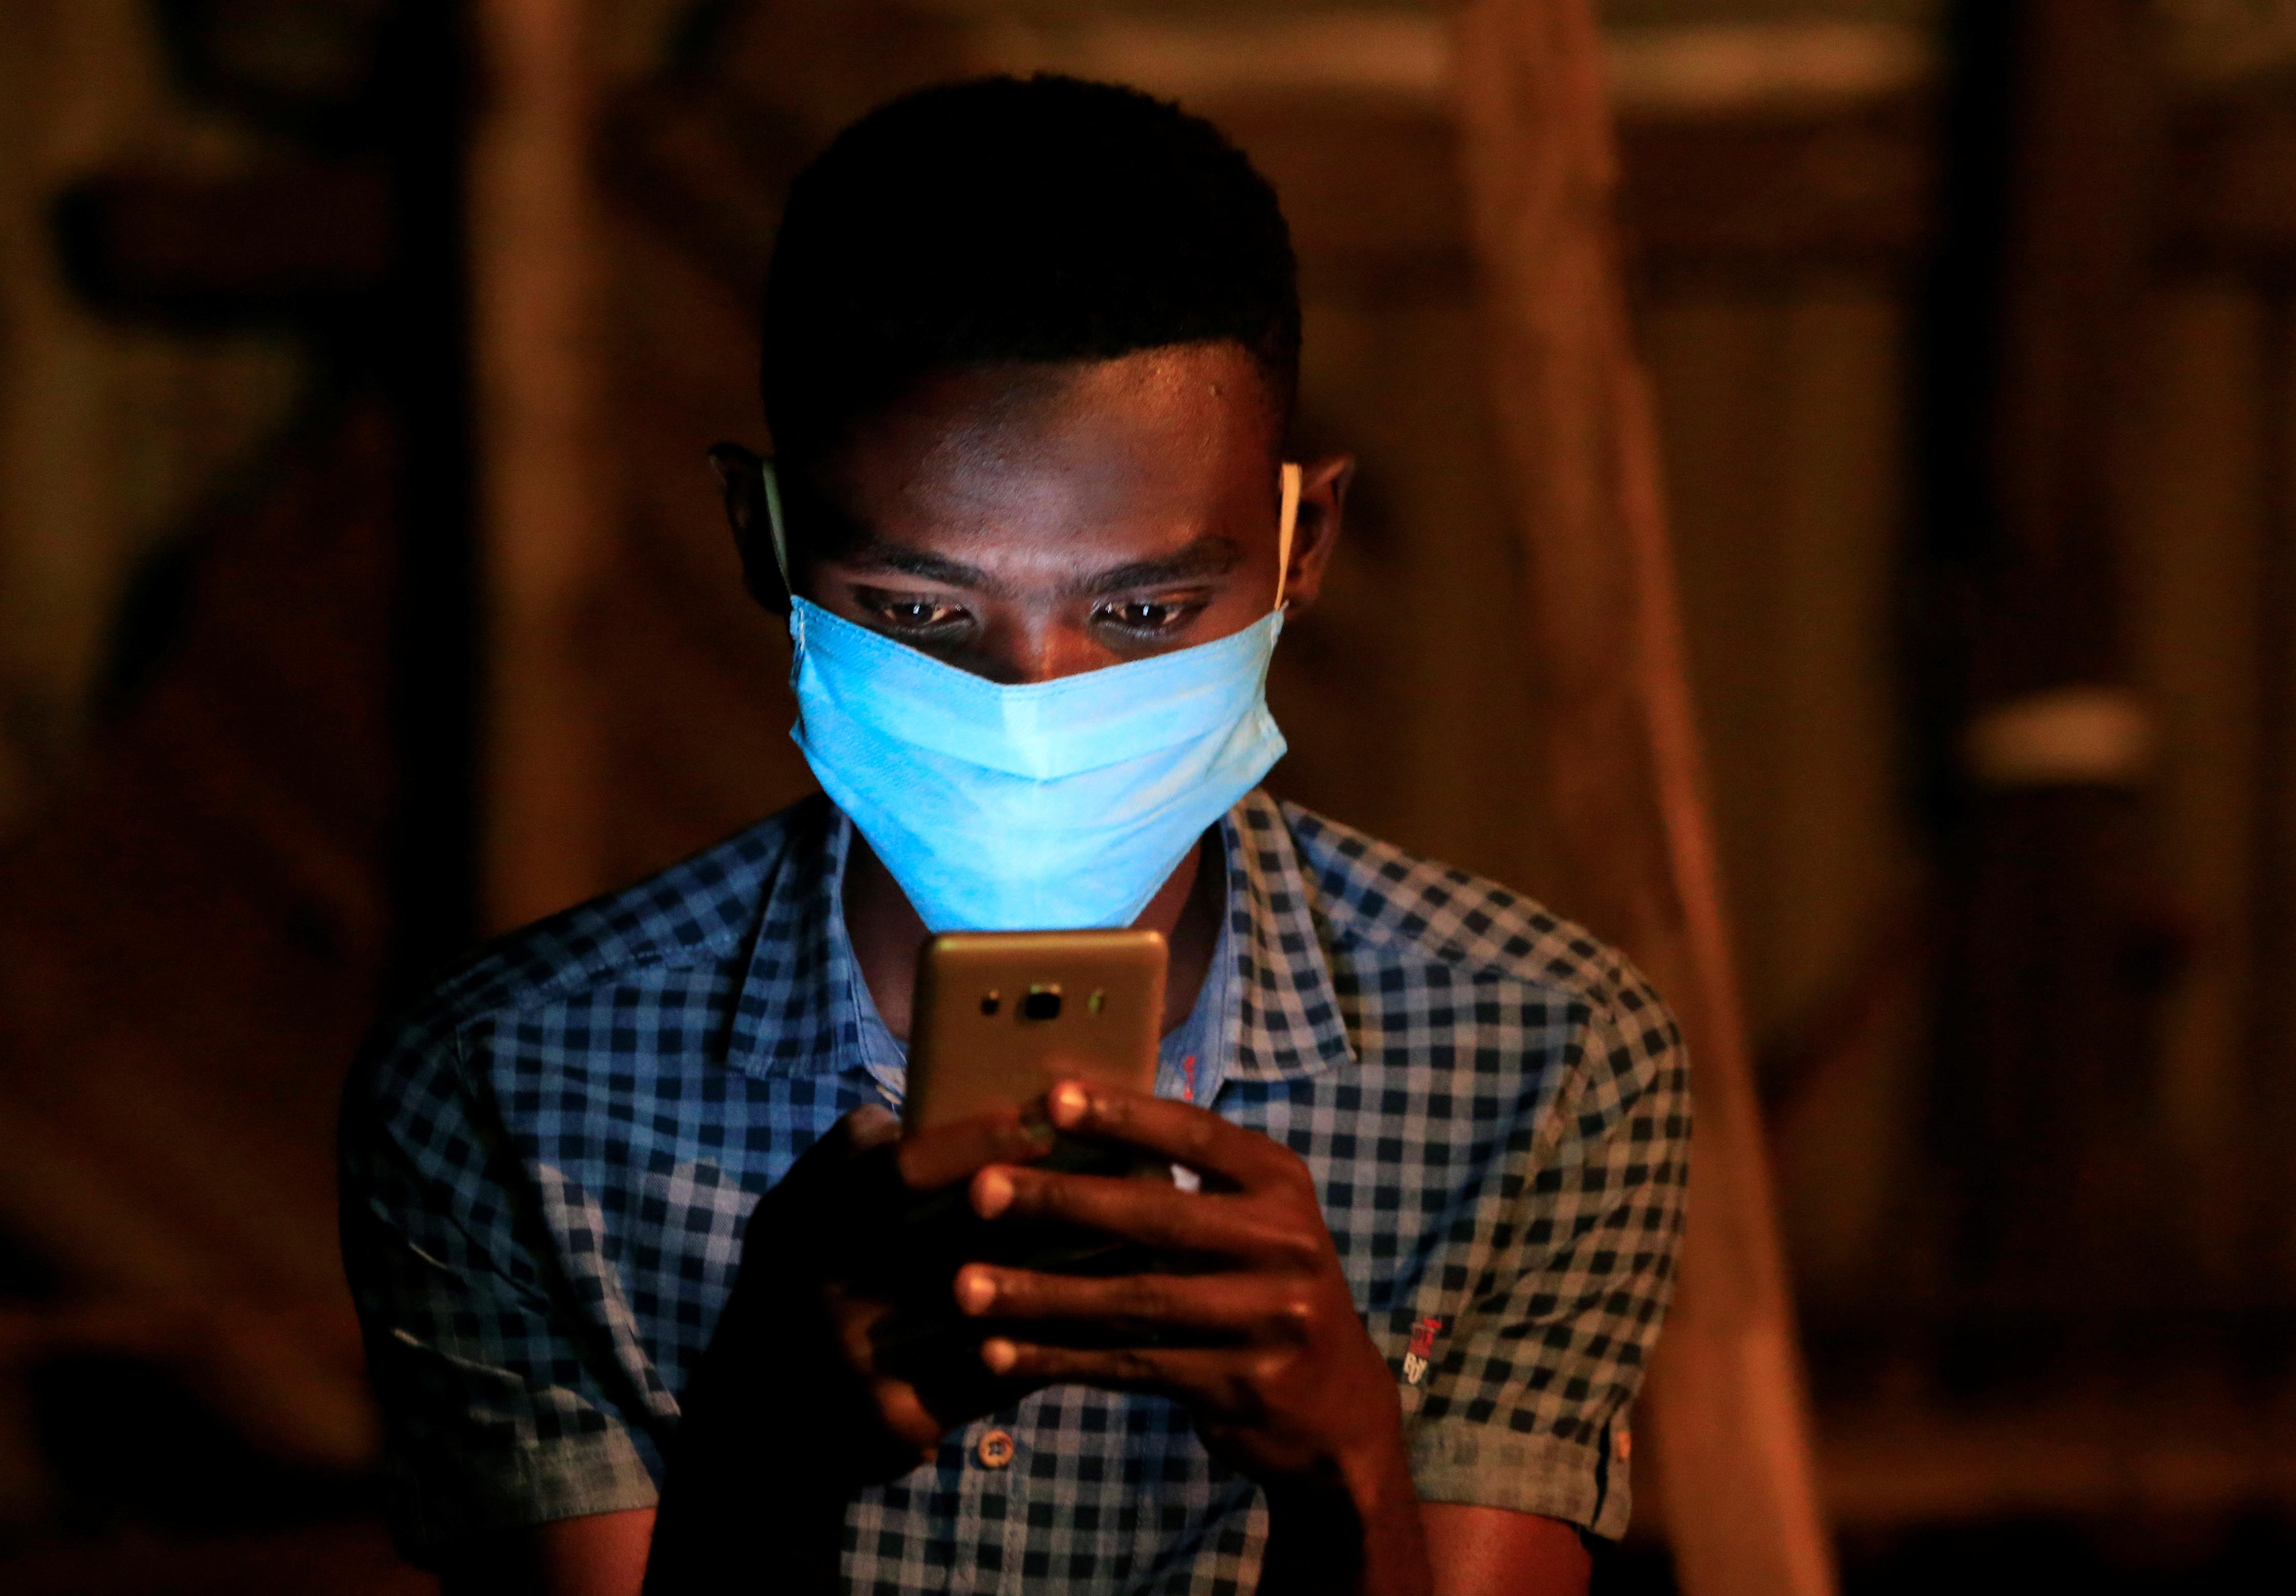 Kenya universal basic income social security covid-19 coronavirus business global national risk